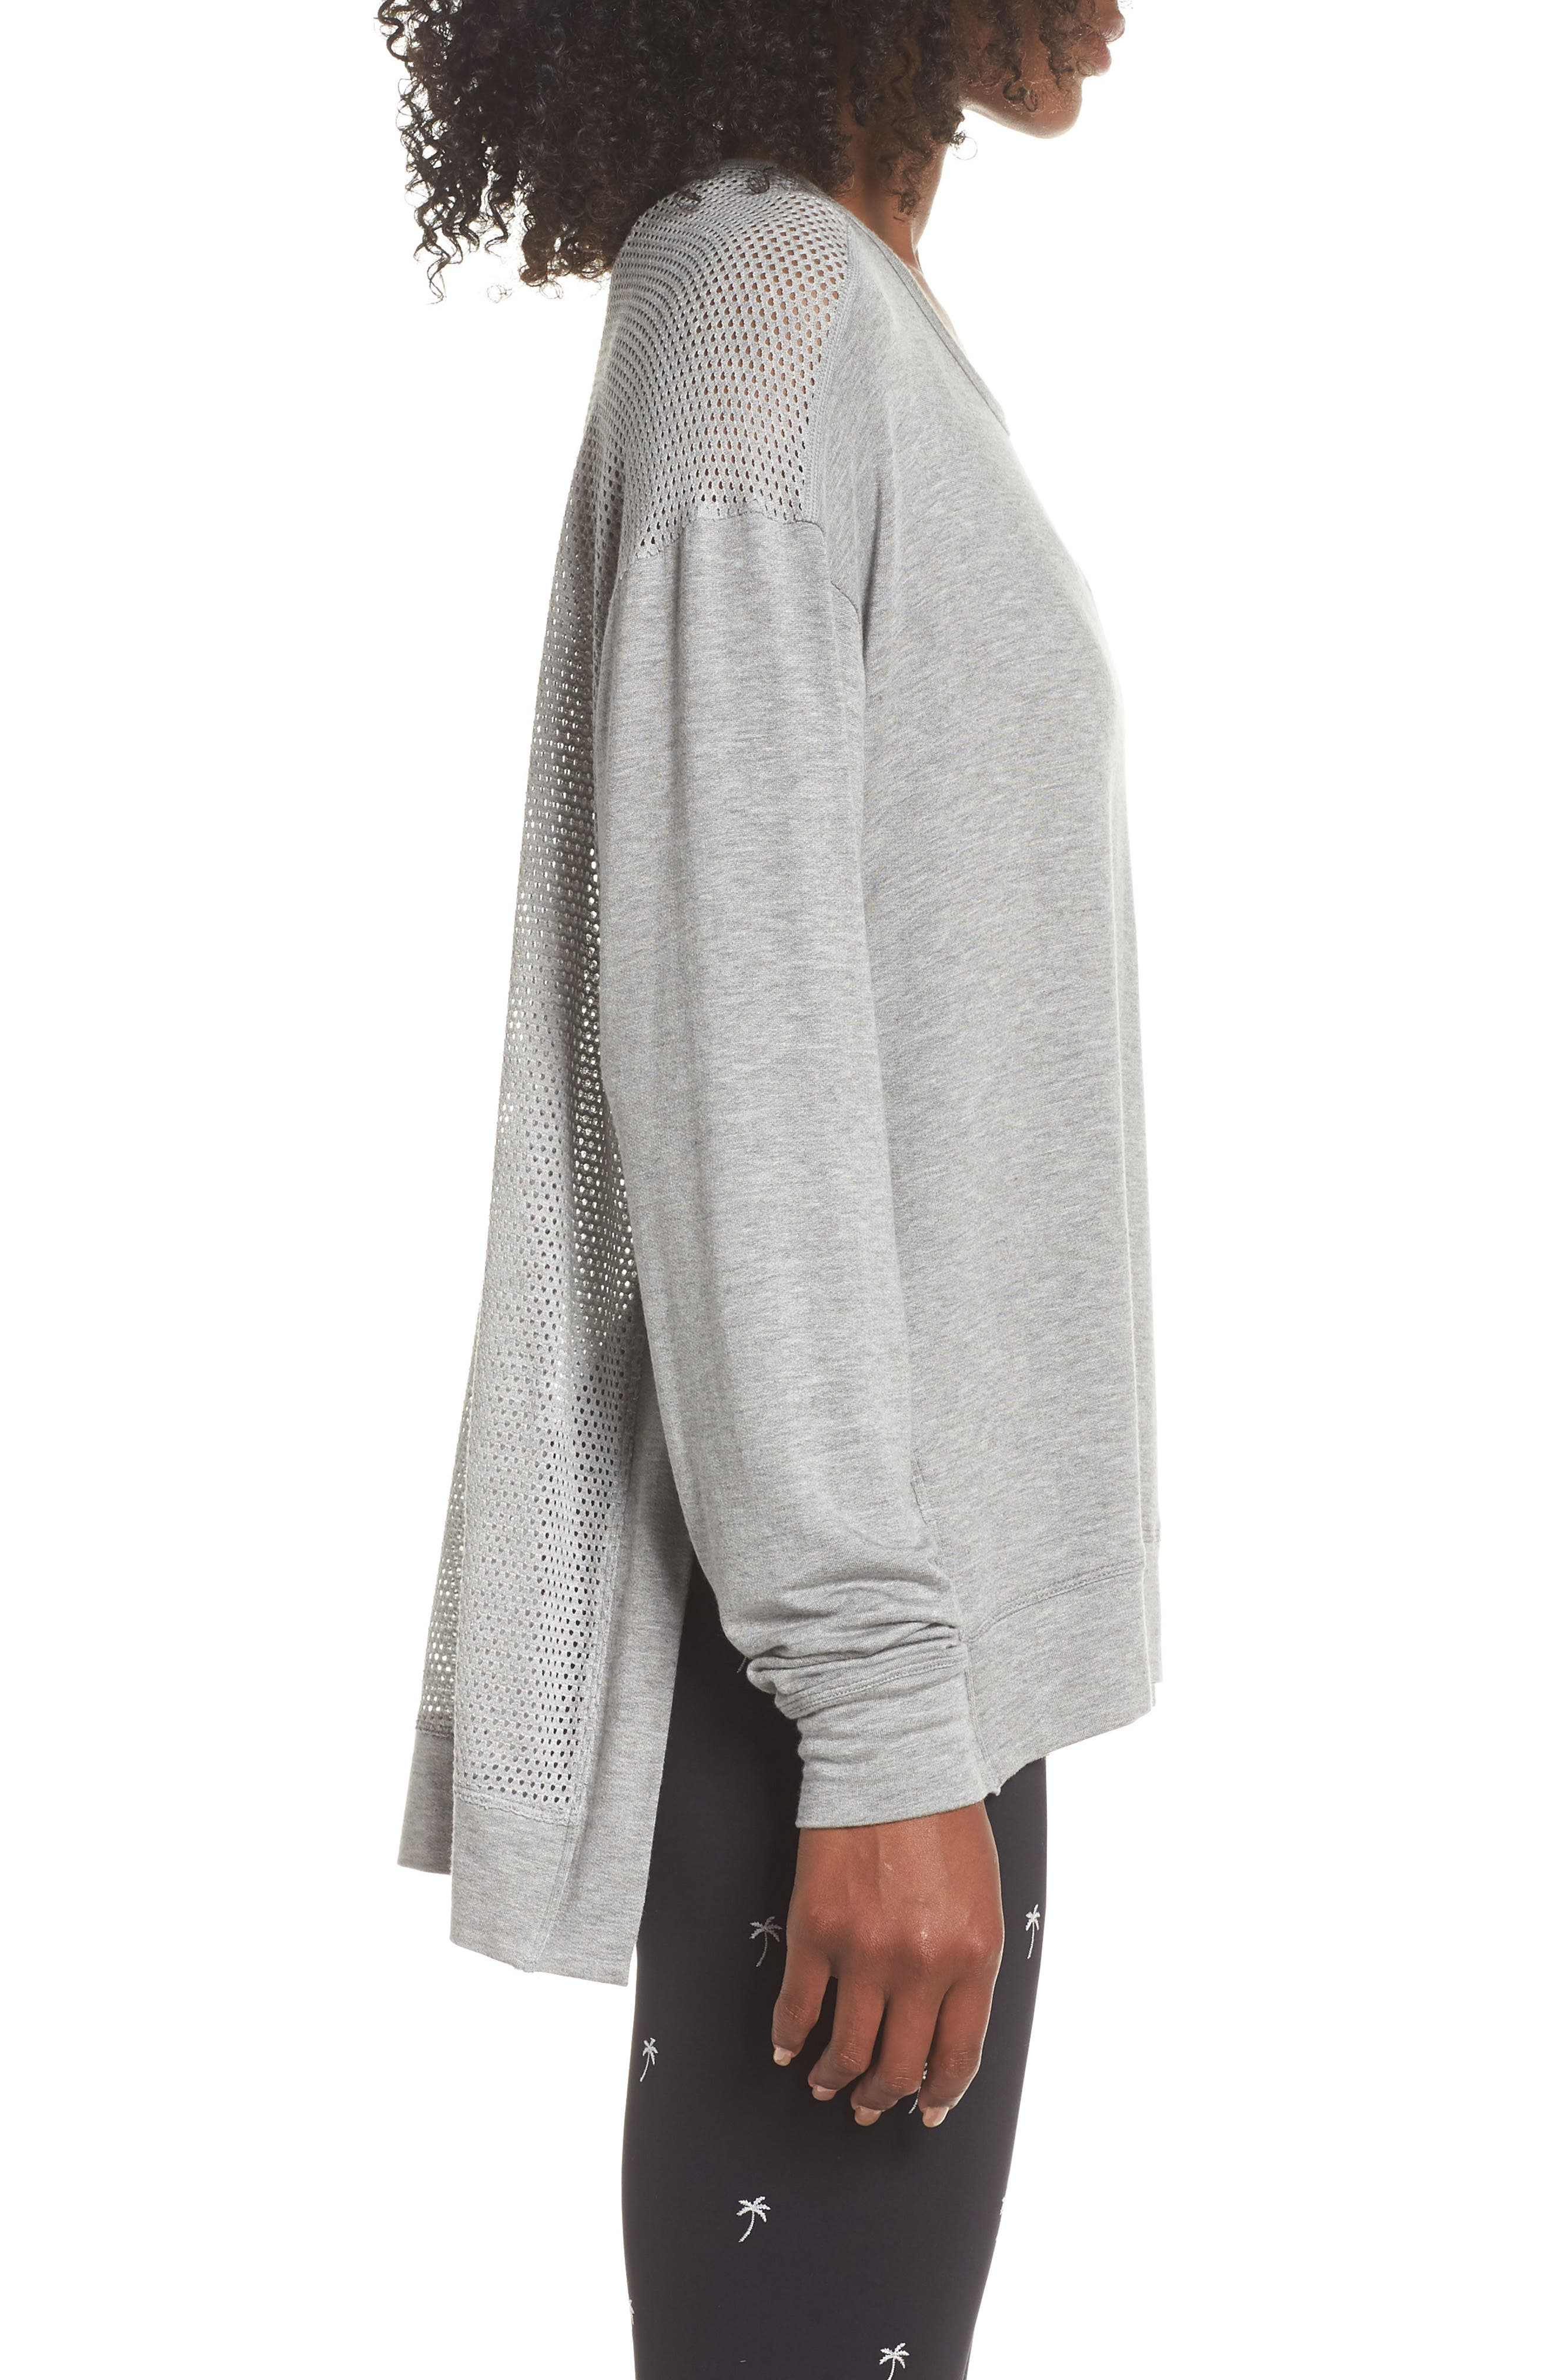 Heron Mesh Back Sweatshirt,                             Alternate thumbnail 3, color,                             Heather Grey